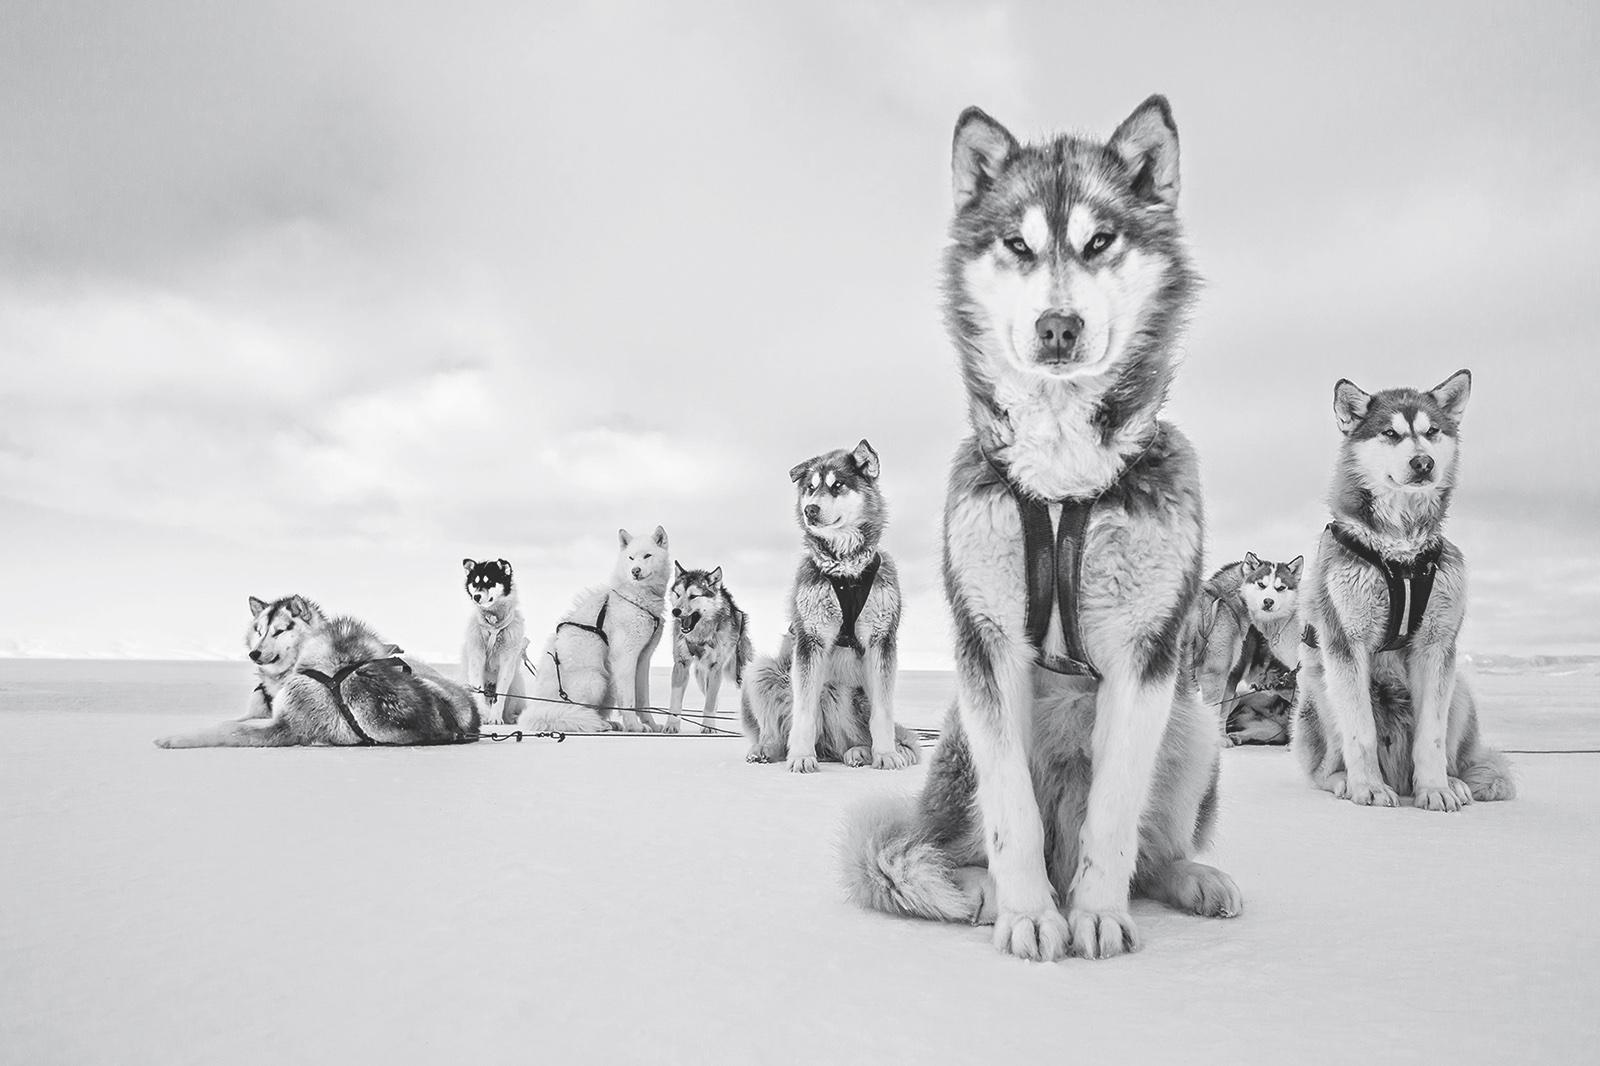 foto: © 2018 Cristina Mittermeier. All rights reserved. www.sealegacy.org - Alpha Dog, Greenlandic Huskies, Thule, Greenland, April 2015